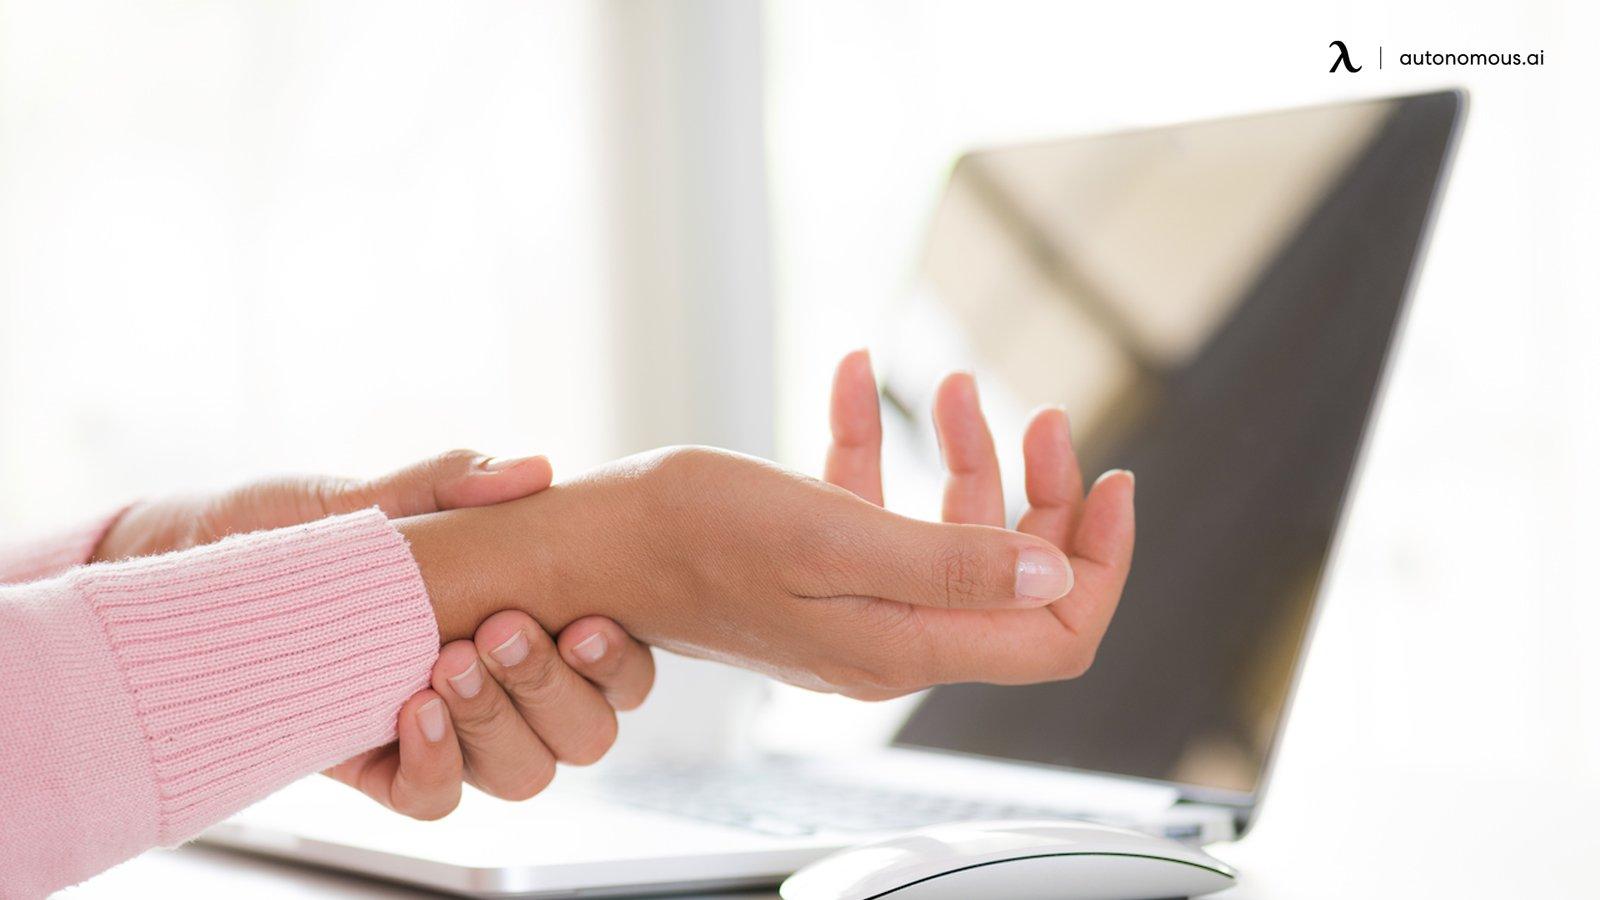 Wrist pain from non ergonomic workstation